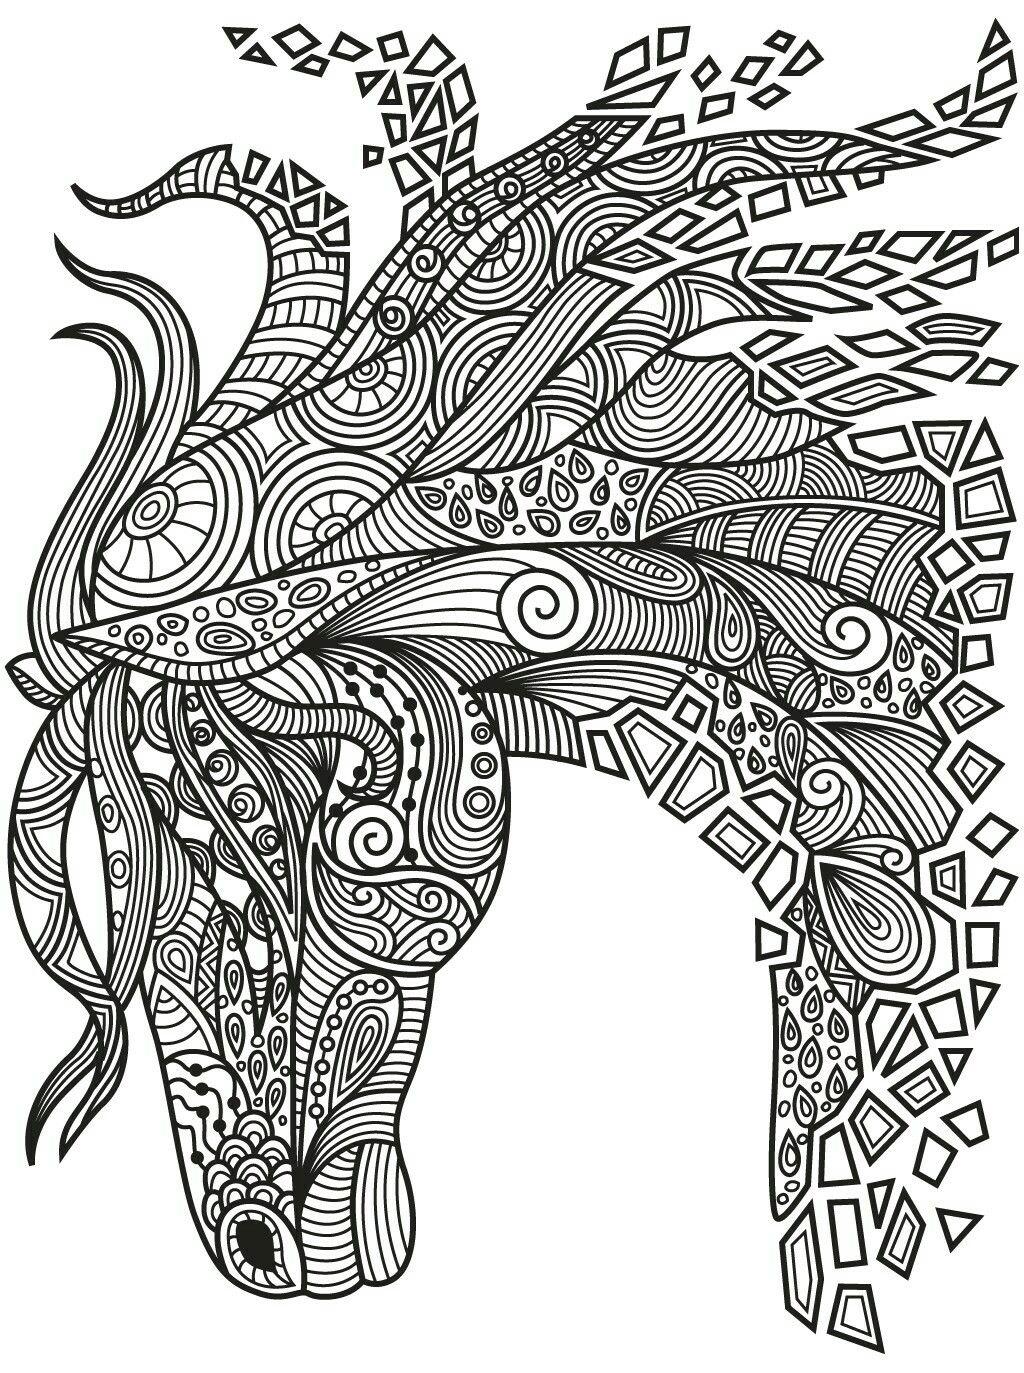 1024x1373 Beautiful Zentangle Horse Colorish Coloring Book App For Adults